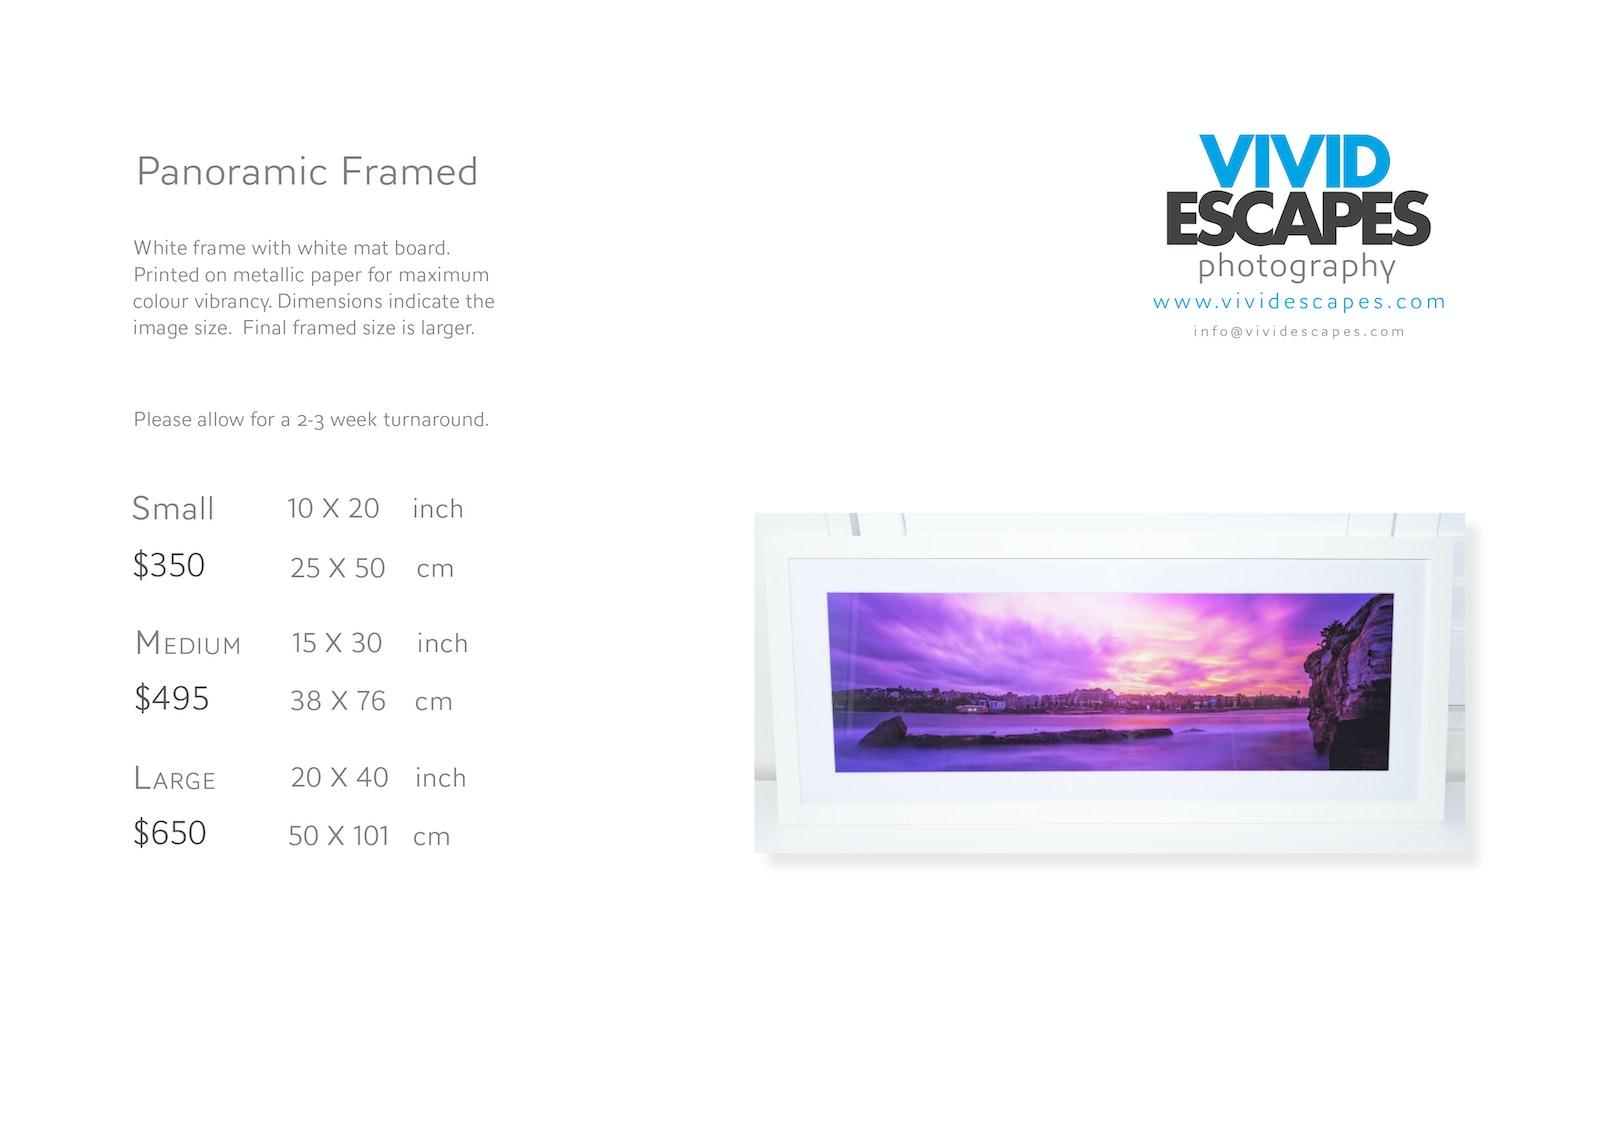 Vivid_Escapes_Price_List_NEW4